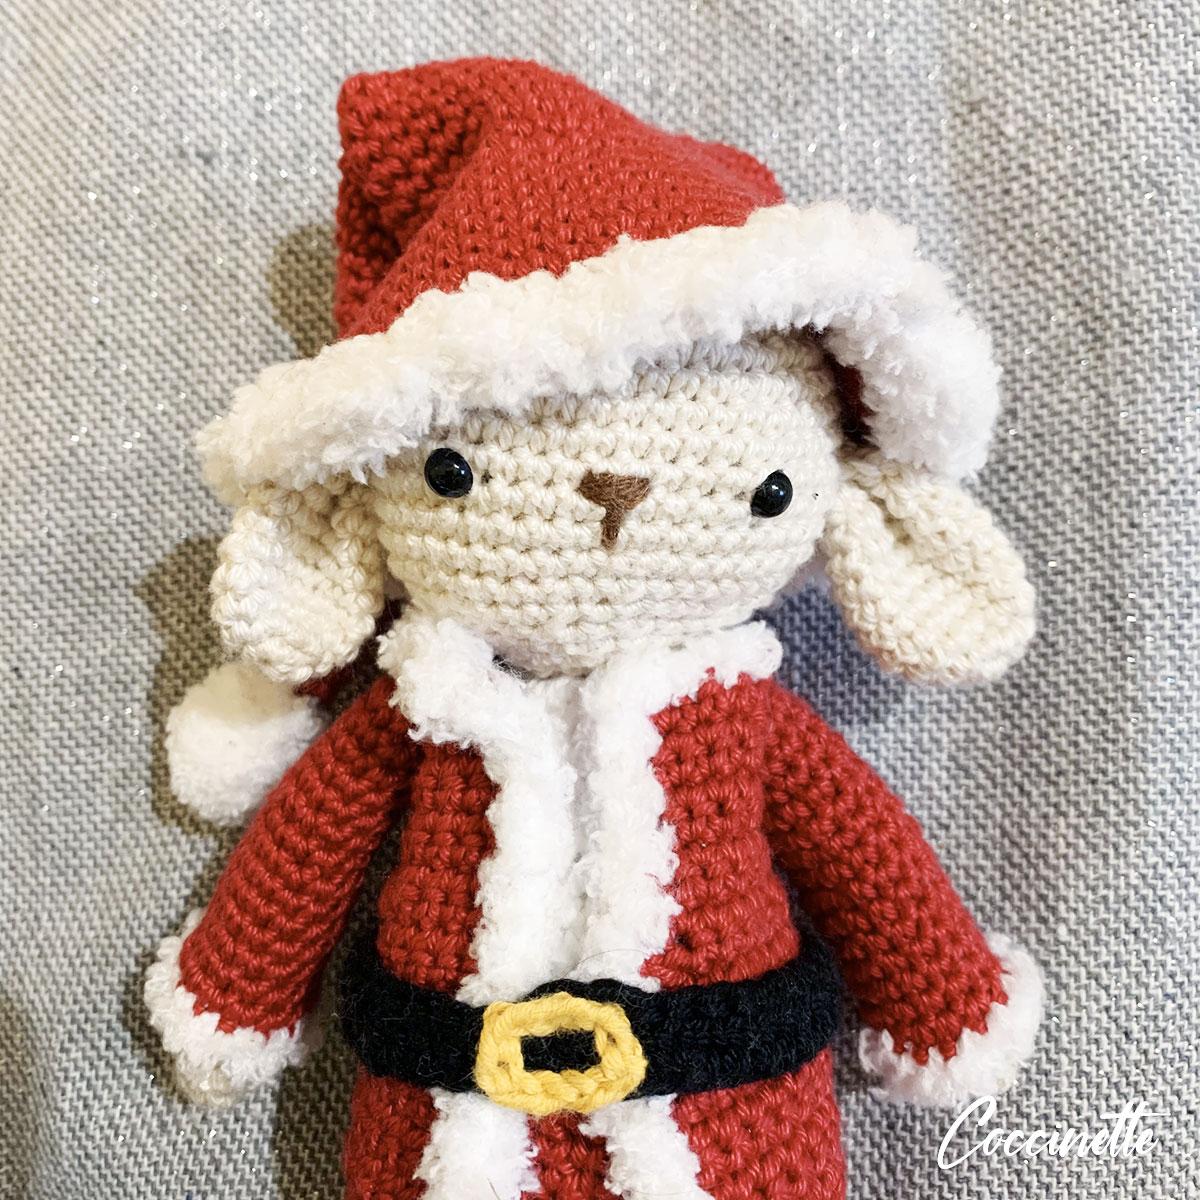 Philibert avec son bonnet de Noël